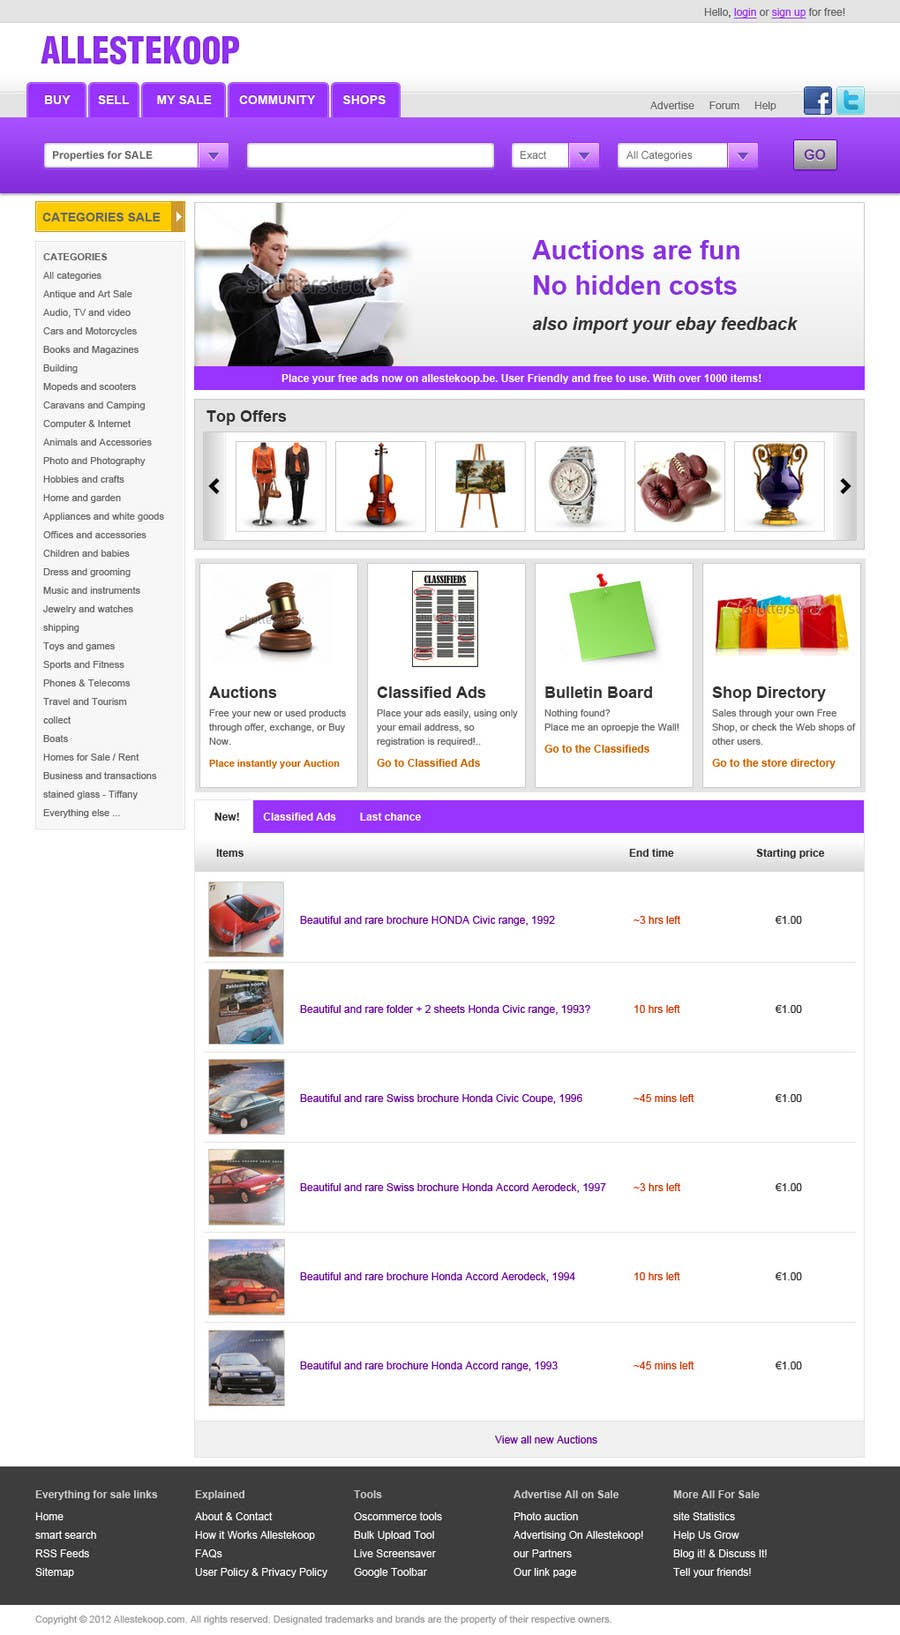 Bài tham dự cuộc thi #                                        9                                      cho                                         Website Design for auction/classifieds